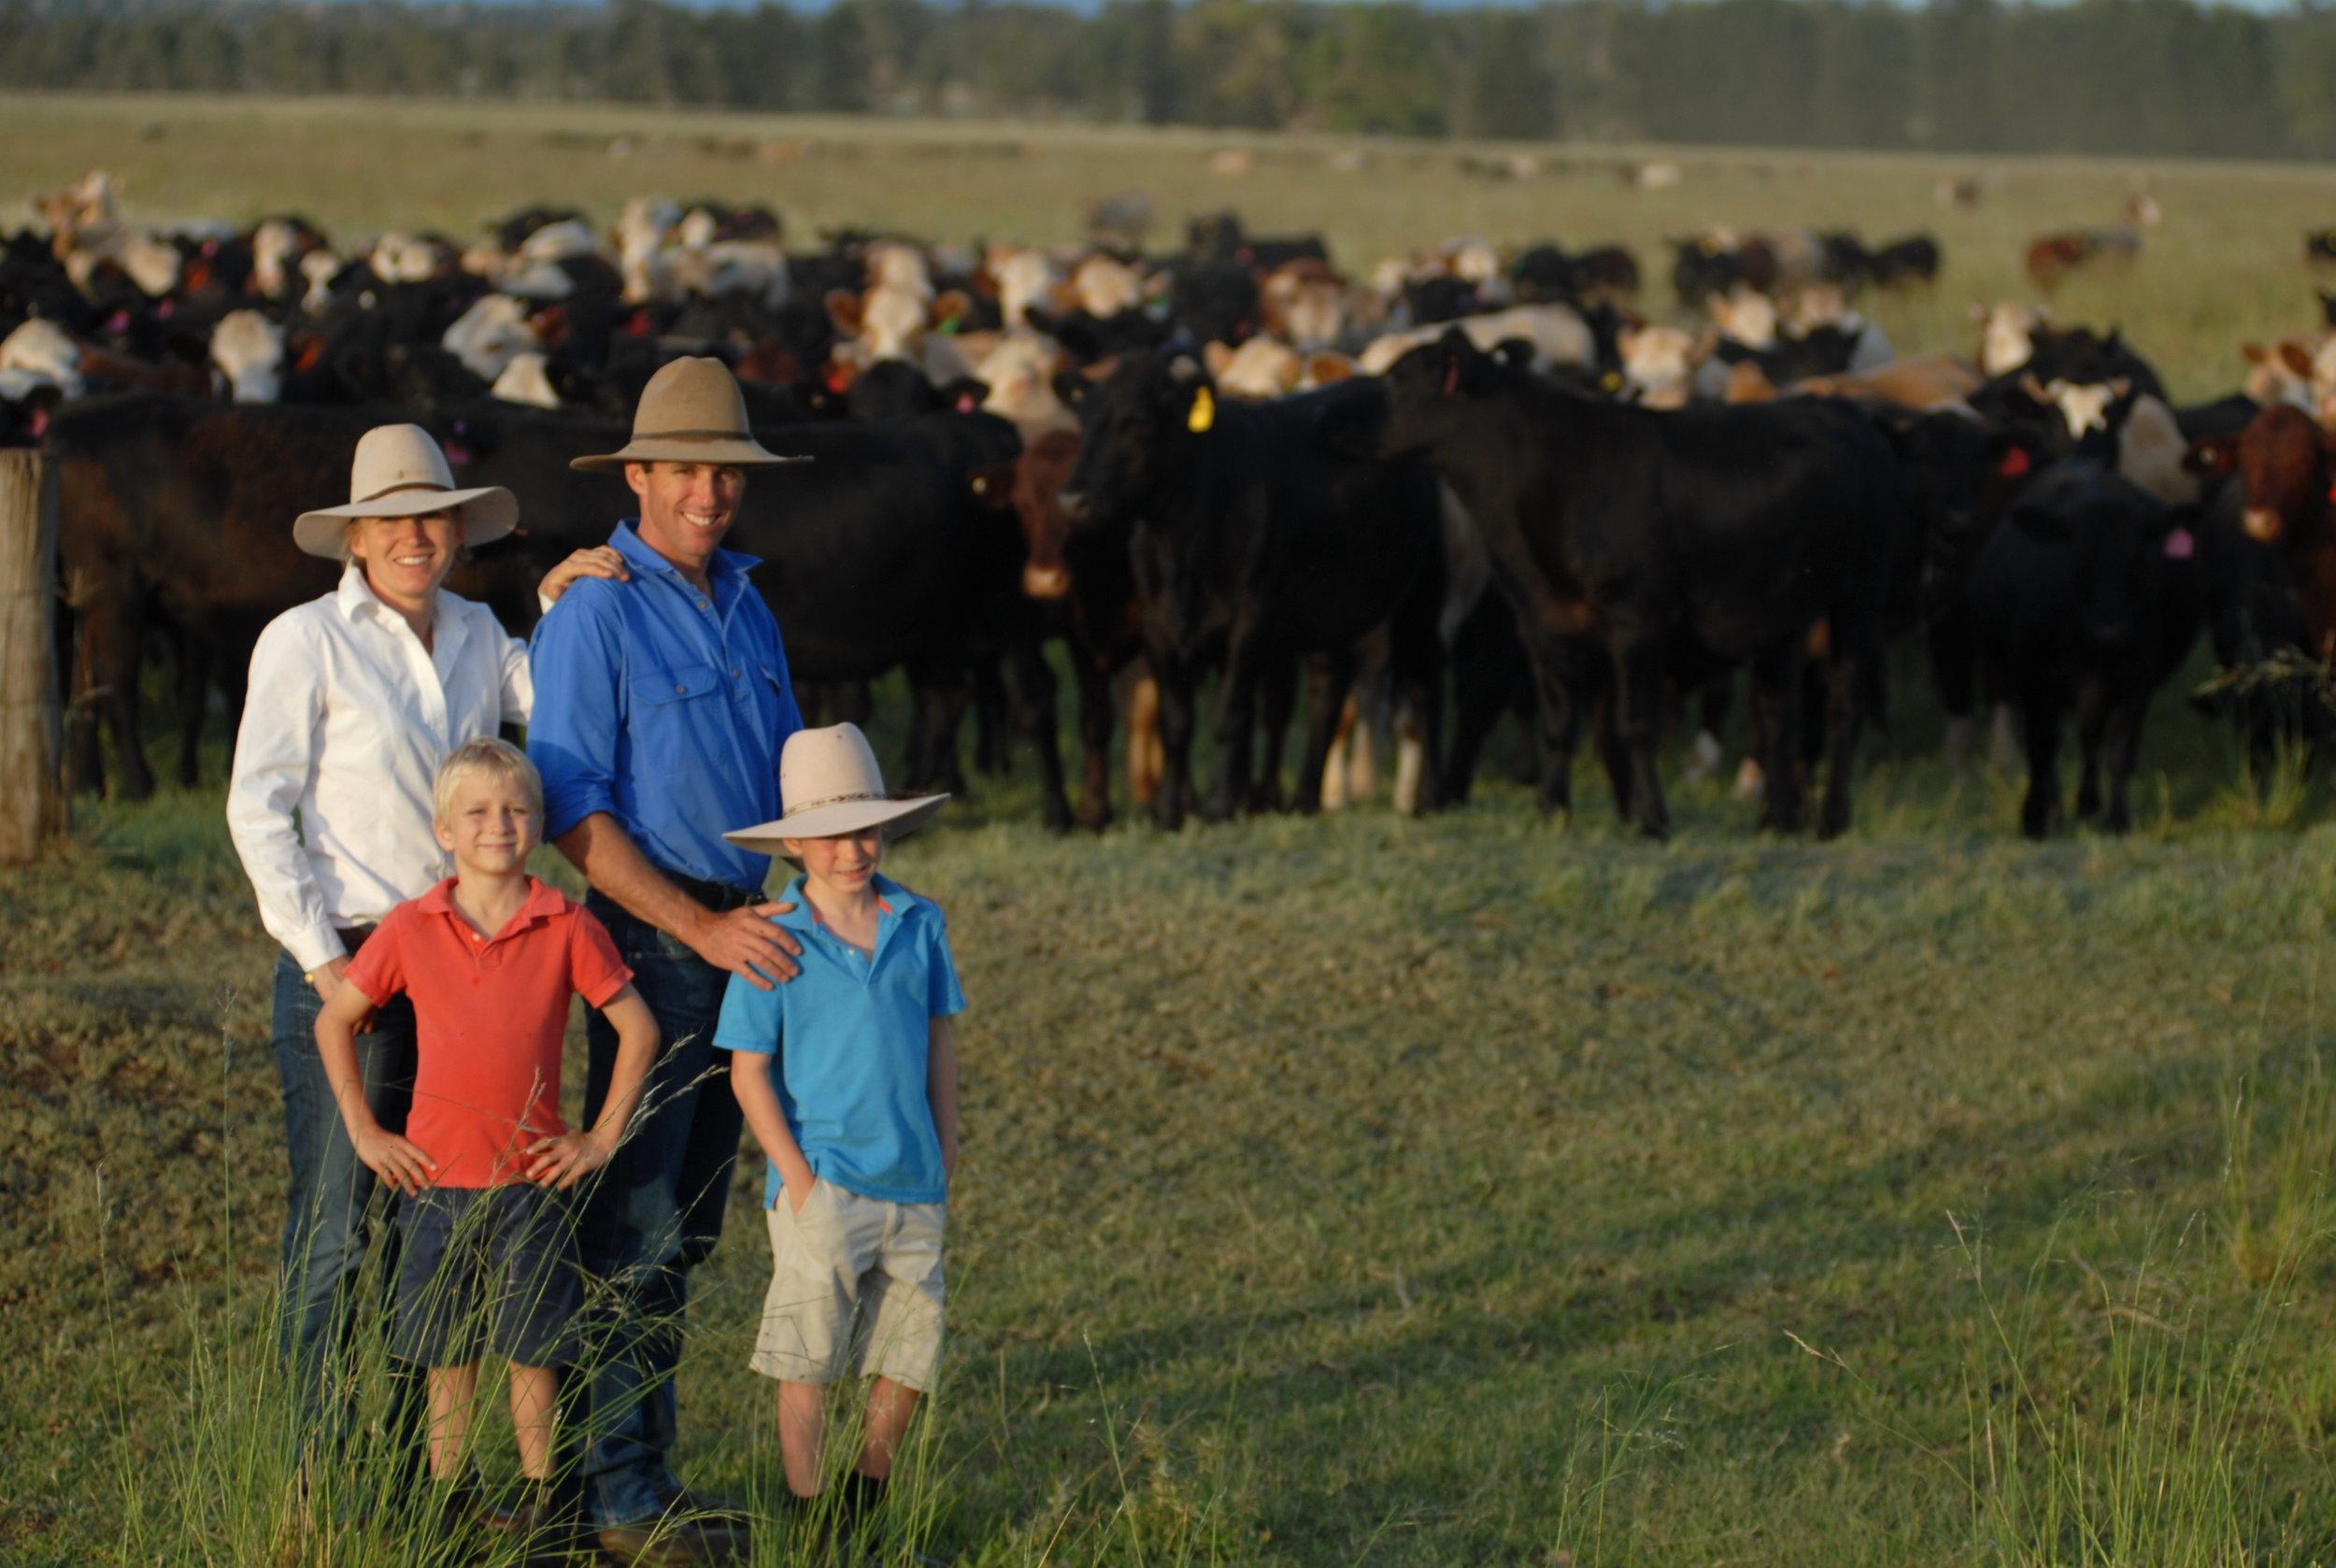 Visit My Farm Australia - Colorado, Quirindi NSW